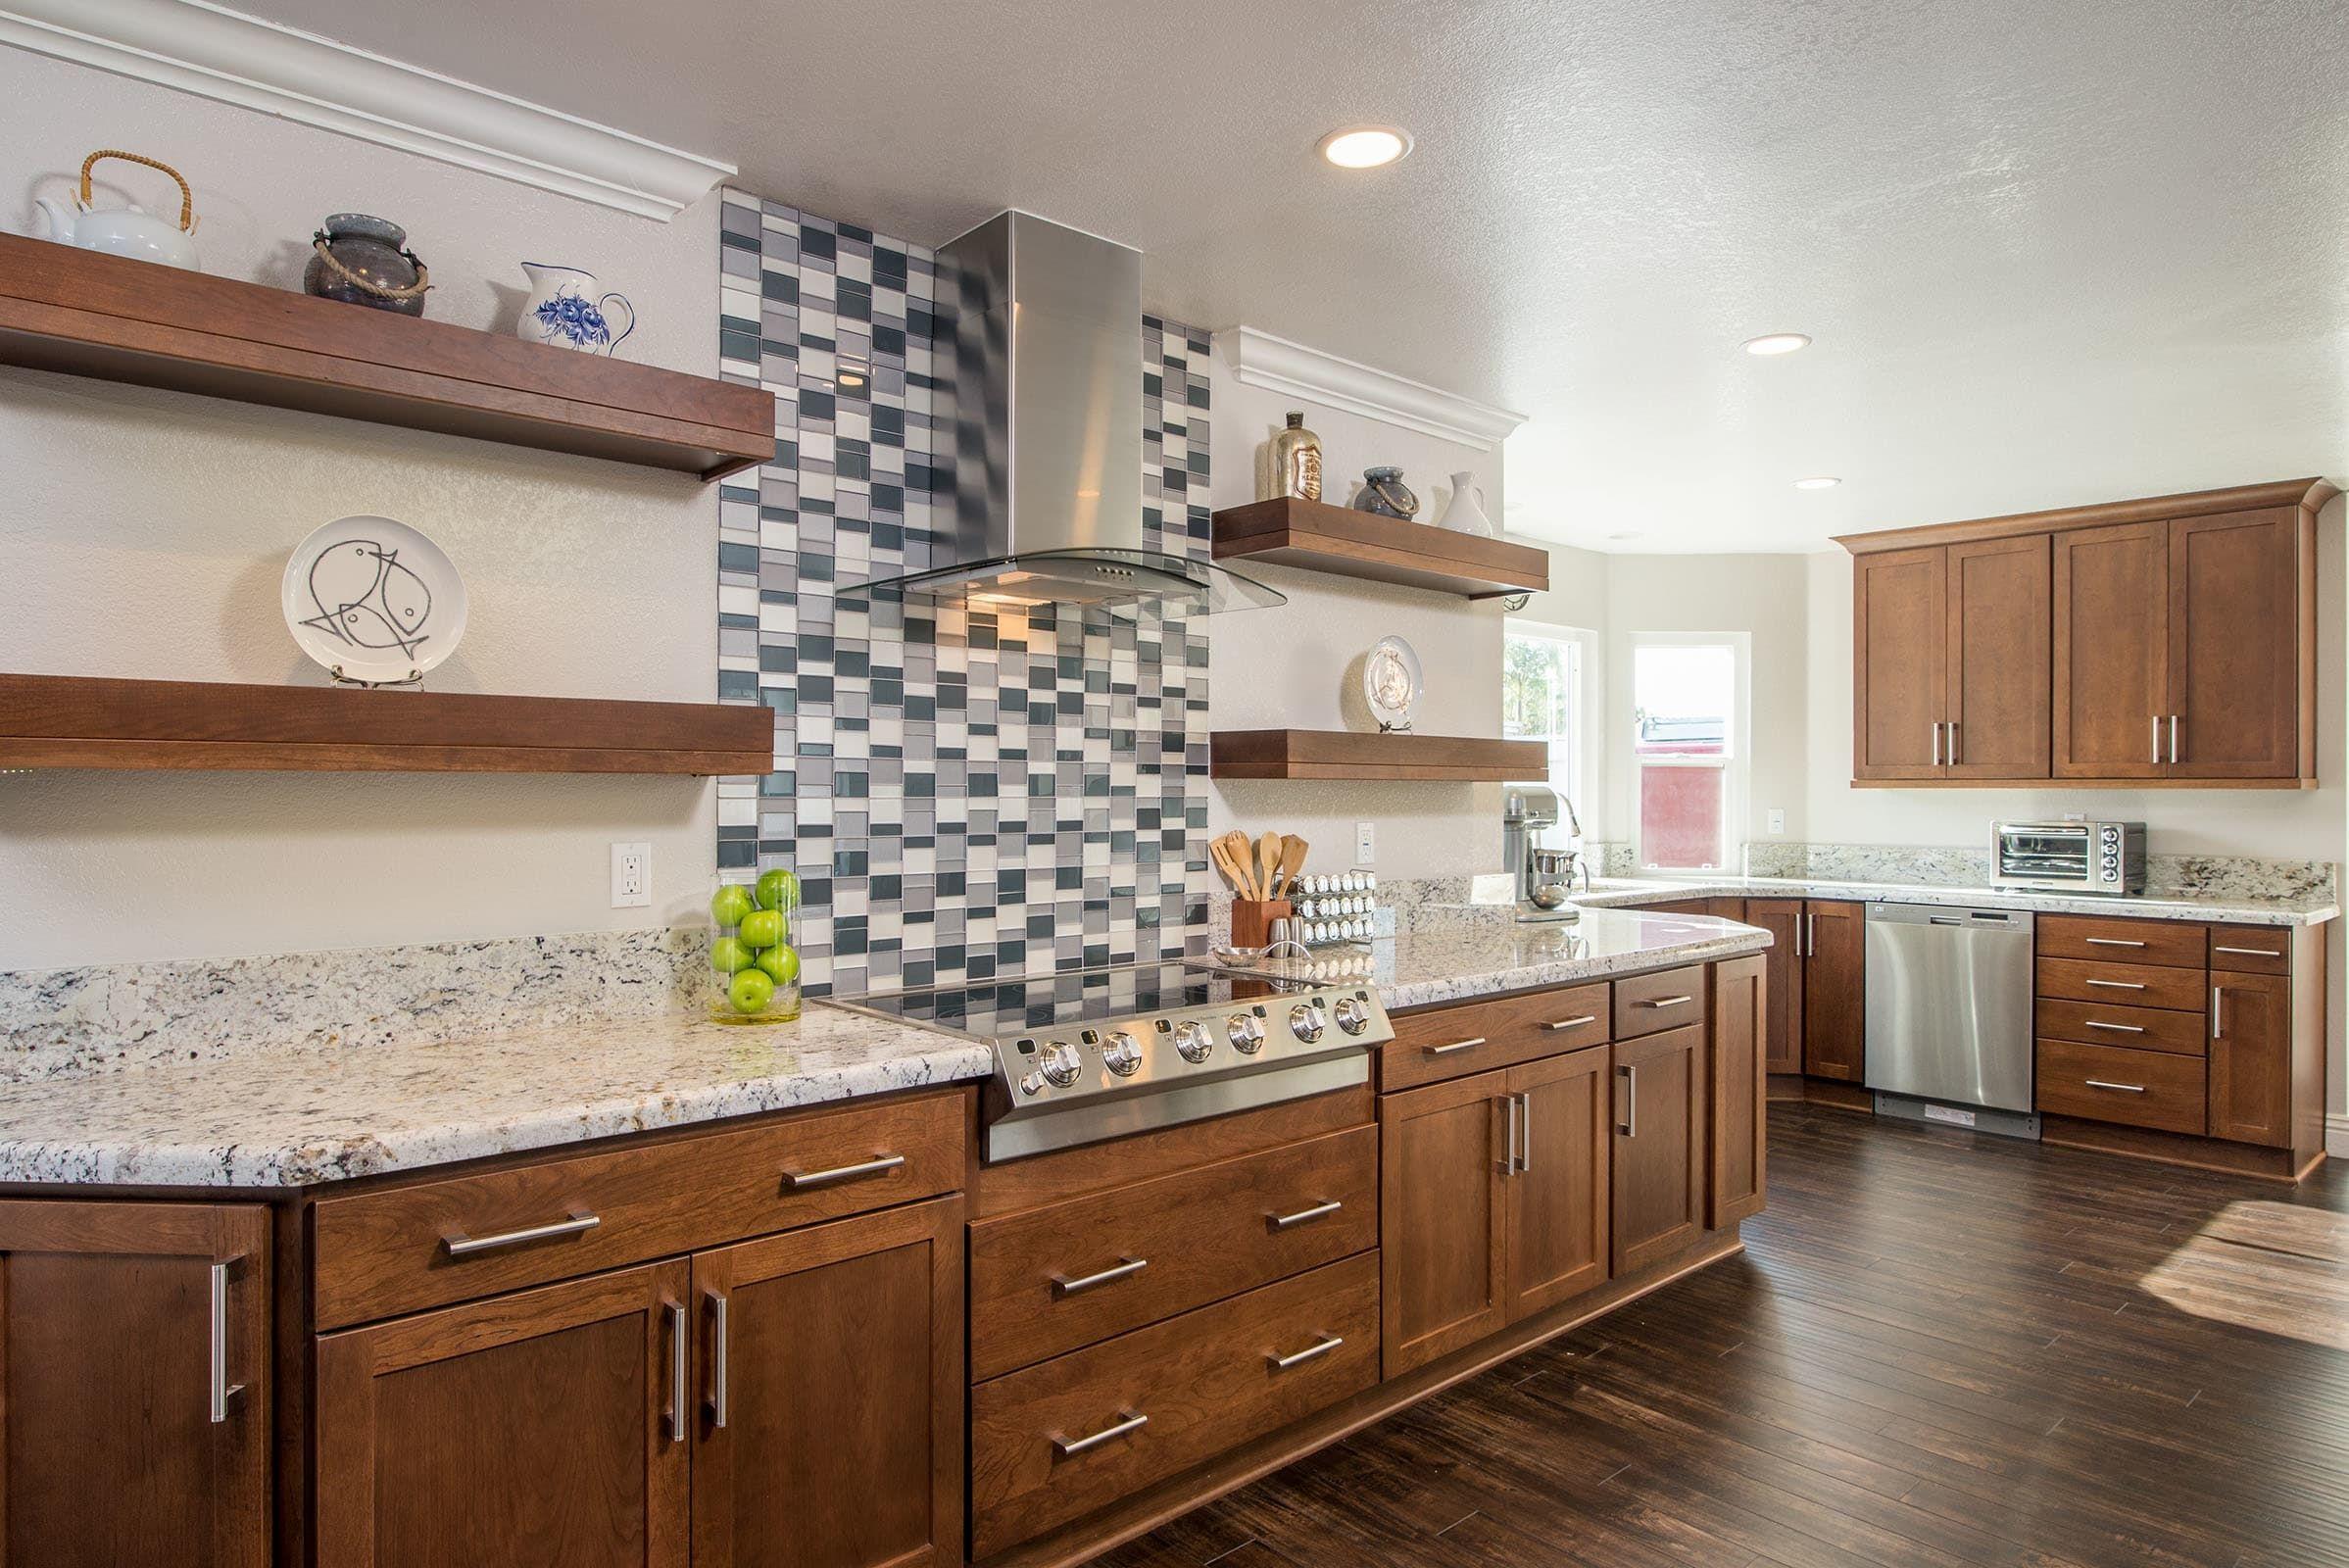 best way to finance a kitchen remodel | http://sodakaustica